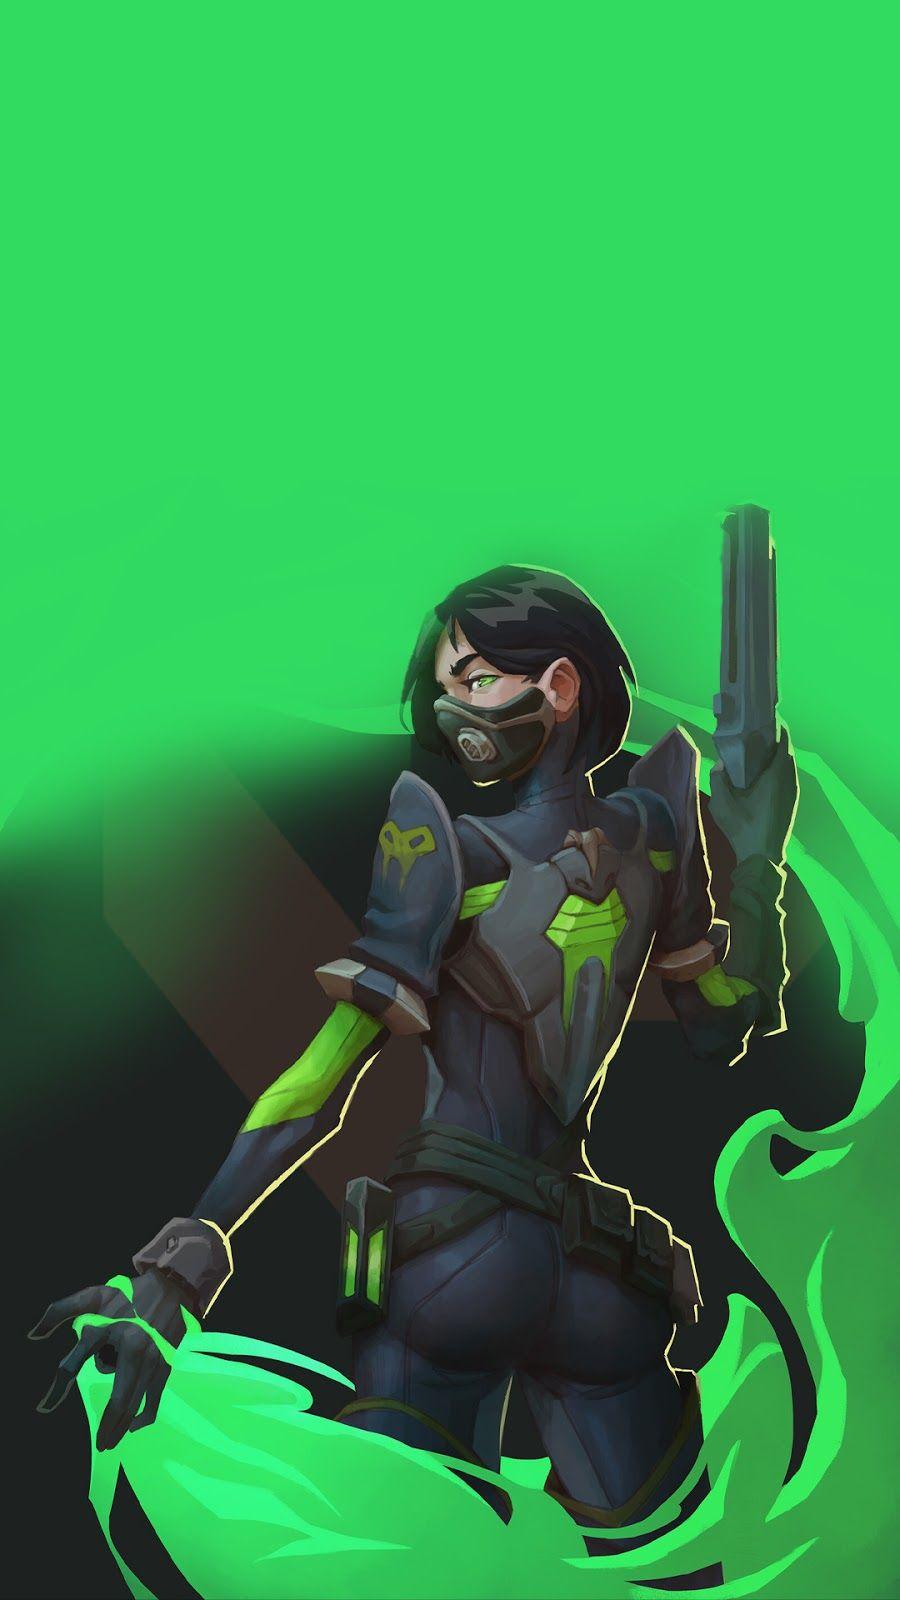 Viper Valorant Fanart Wallpaper Fan Art Overwatch Hero Concepts Viper Viper valorant 4k fan art wallpaper